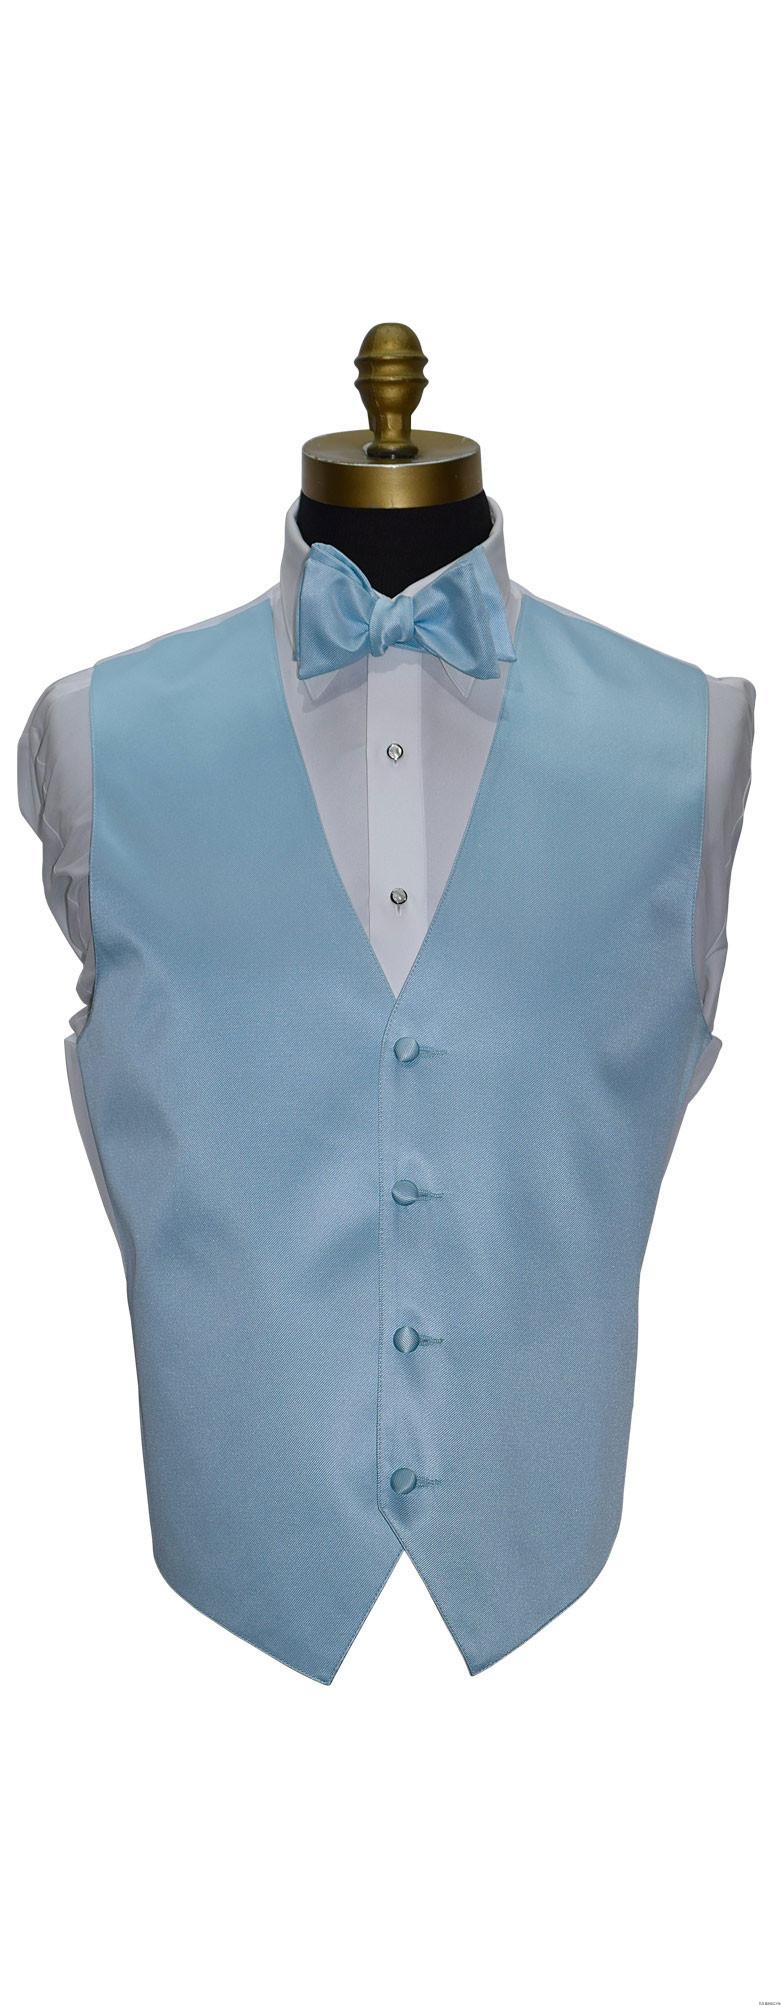 men's and boy's capri blue vest and bowtie by San Miguel Formals